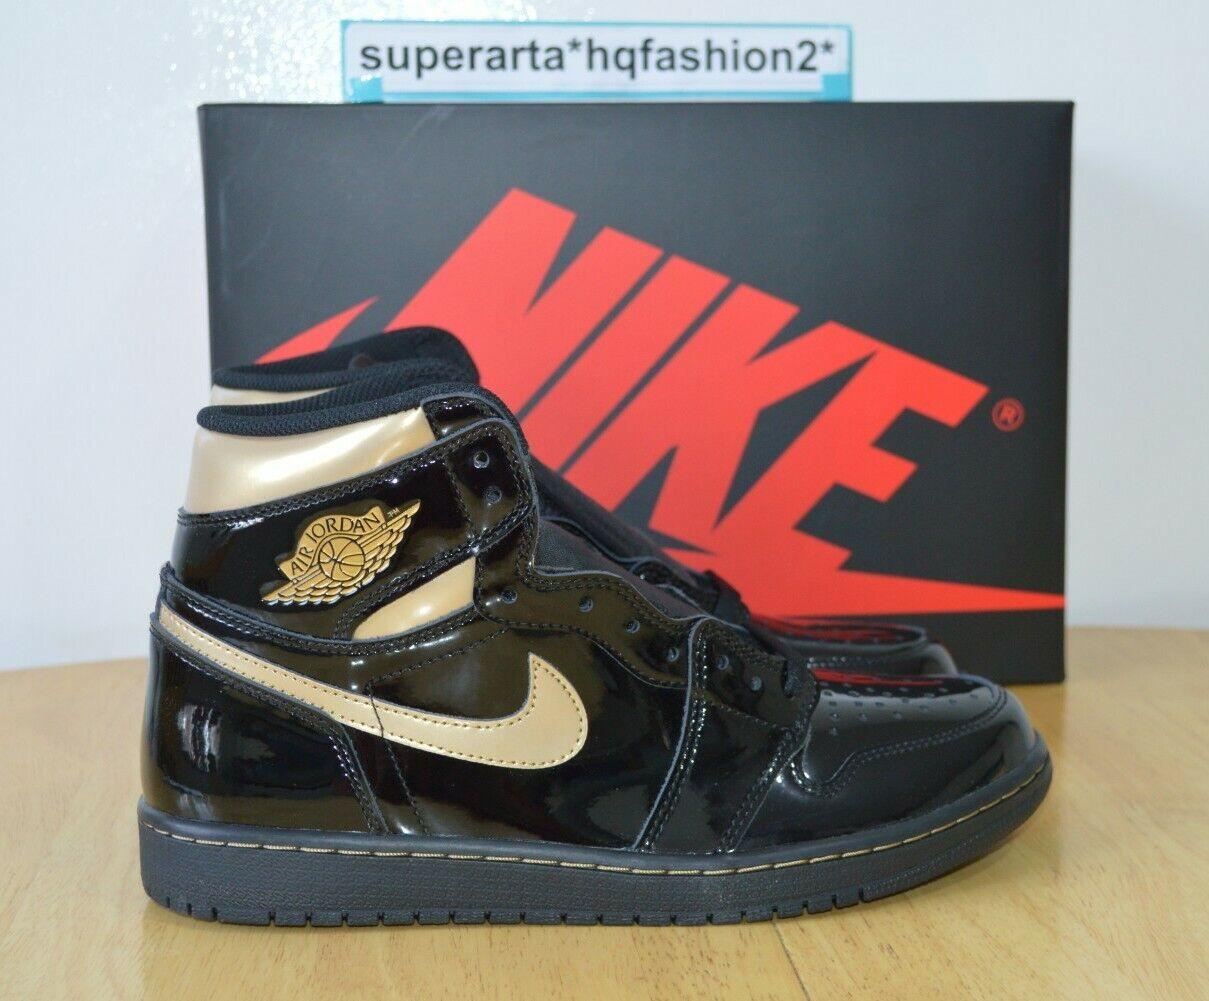 Nike Air Jordan 1 Retro High OG Black Metallic Gold Sneakers Size UK 8.5 EU 43